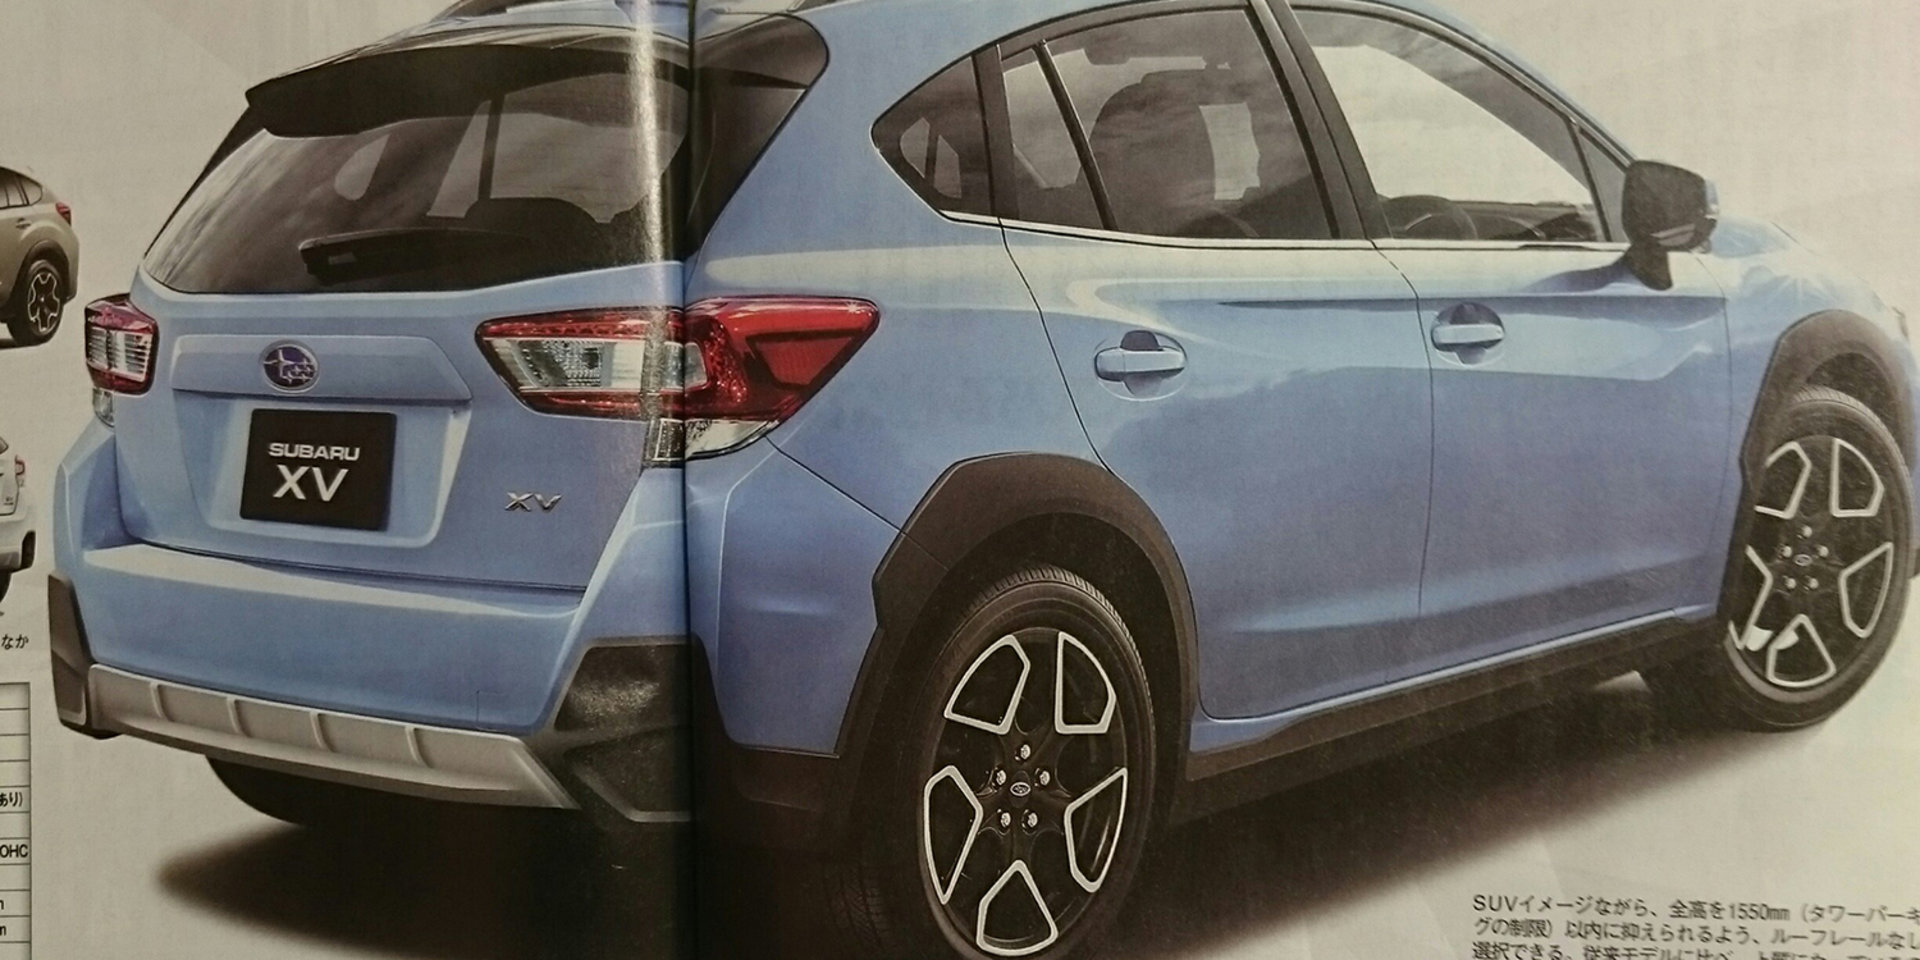 Subaru XV leaked